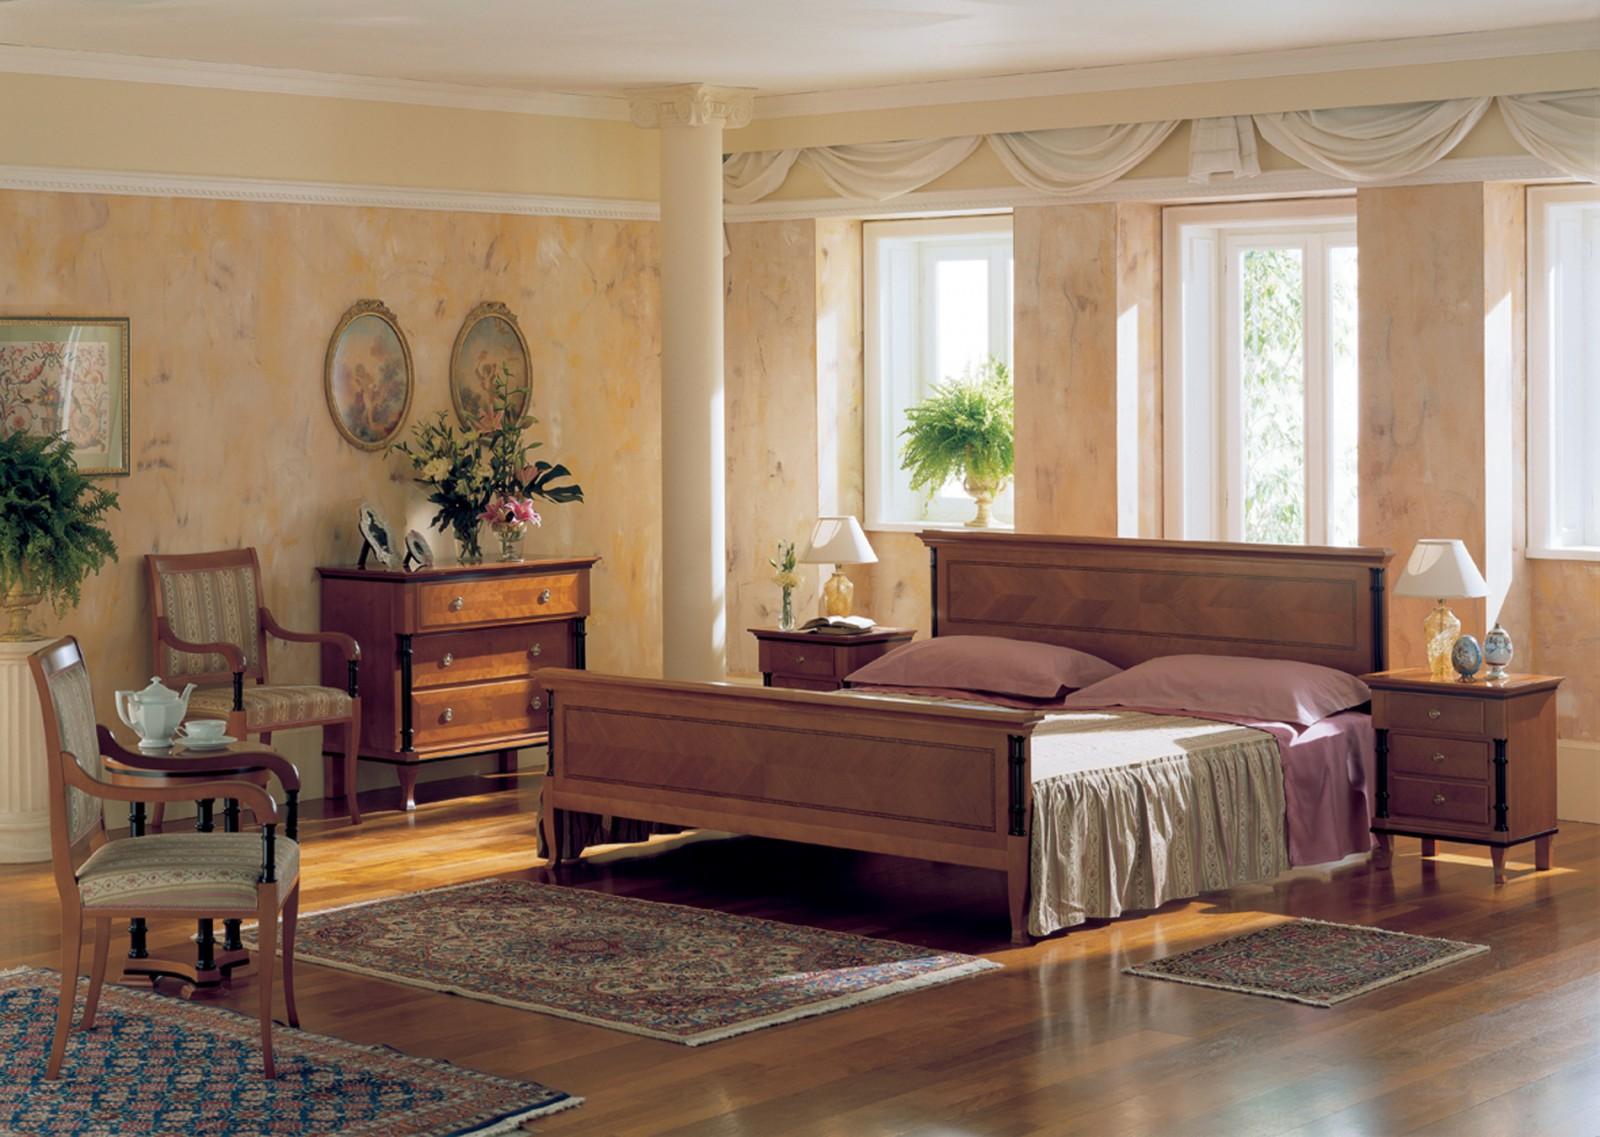 spalnica_bedroom_schlafzimmer_Bidermajer_klasicno-pohistvo_classic-furniture_Klassischen-Moebel_Biedermeier_